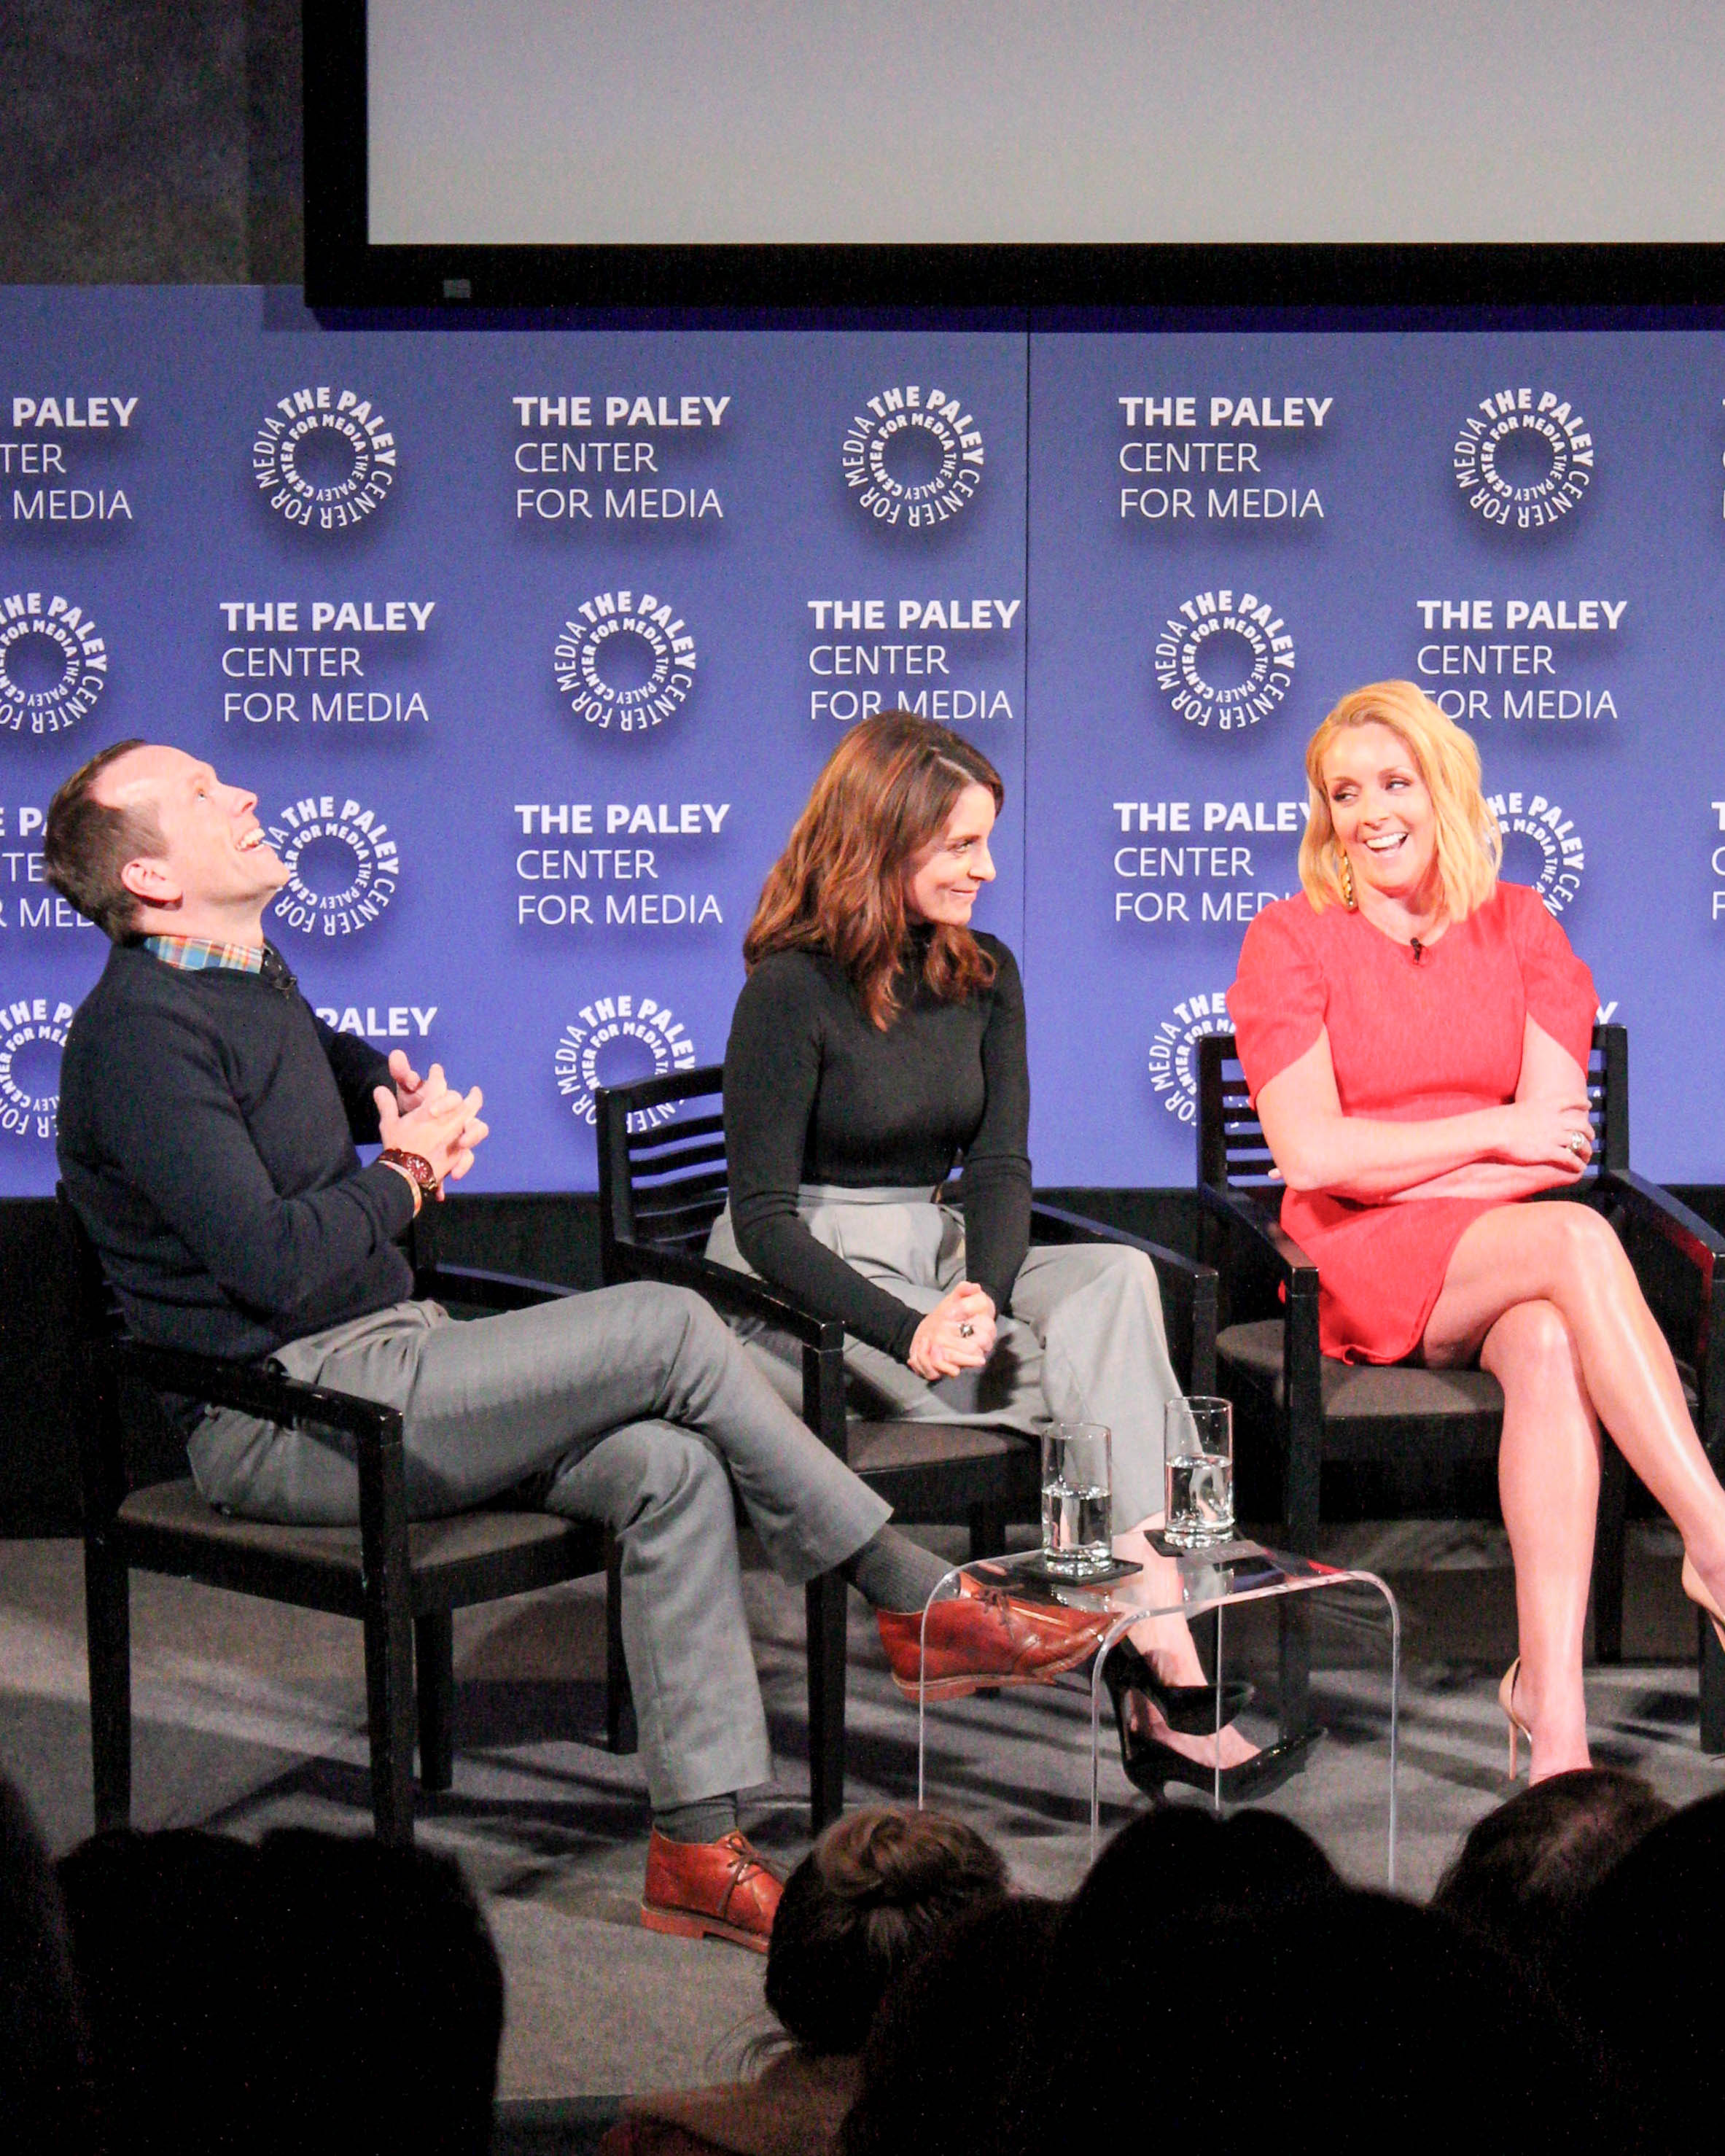 FROM LEFT TO RIGHT: Robert Carlock (Executive Producer), Tina Fey (Executive Producer), Jane Krakowski (Jacqueline)